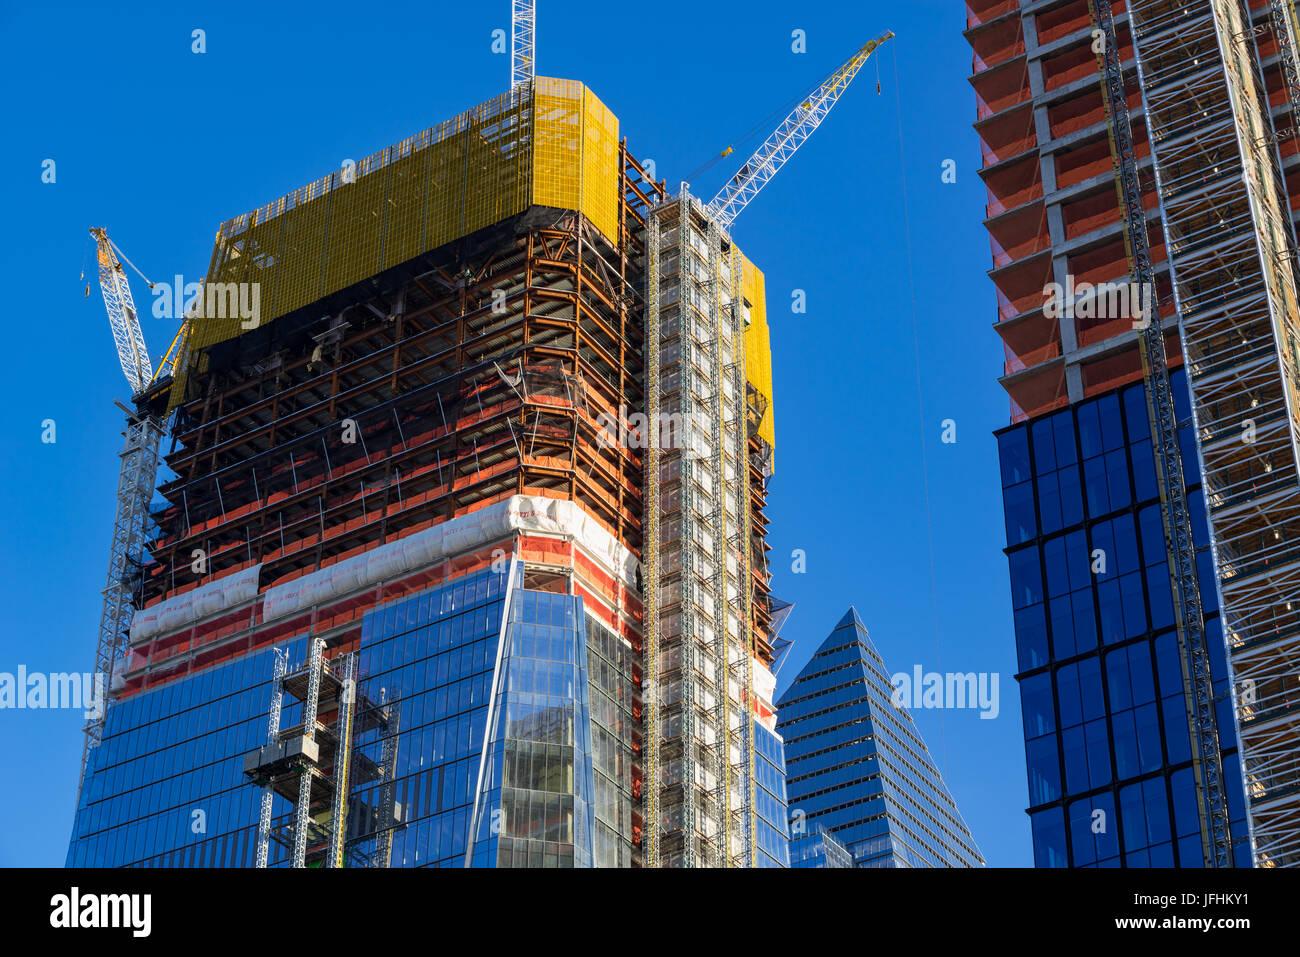 The 30 Hudson Yards skyscraper construction site (2017). Midtown, Manhattan, New York City - Stock Image